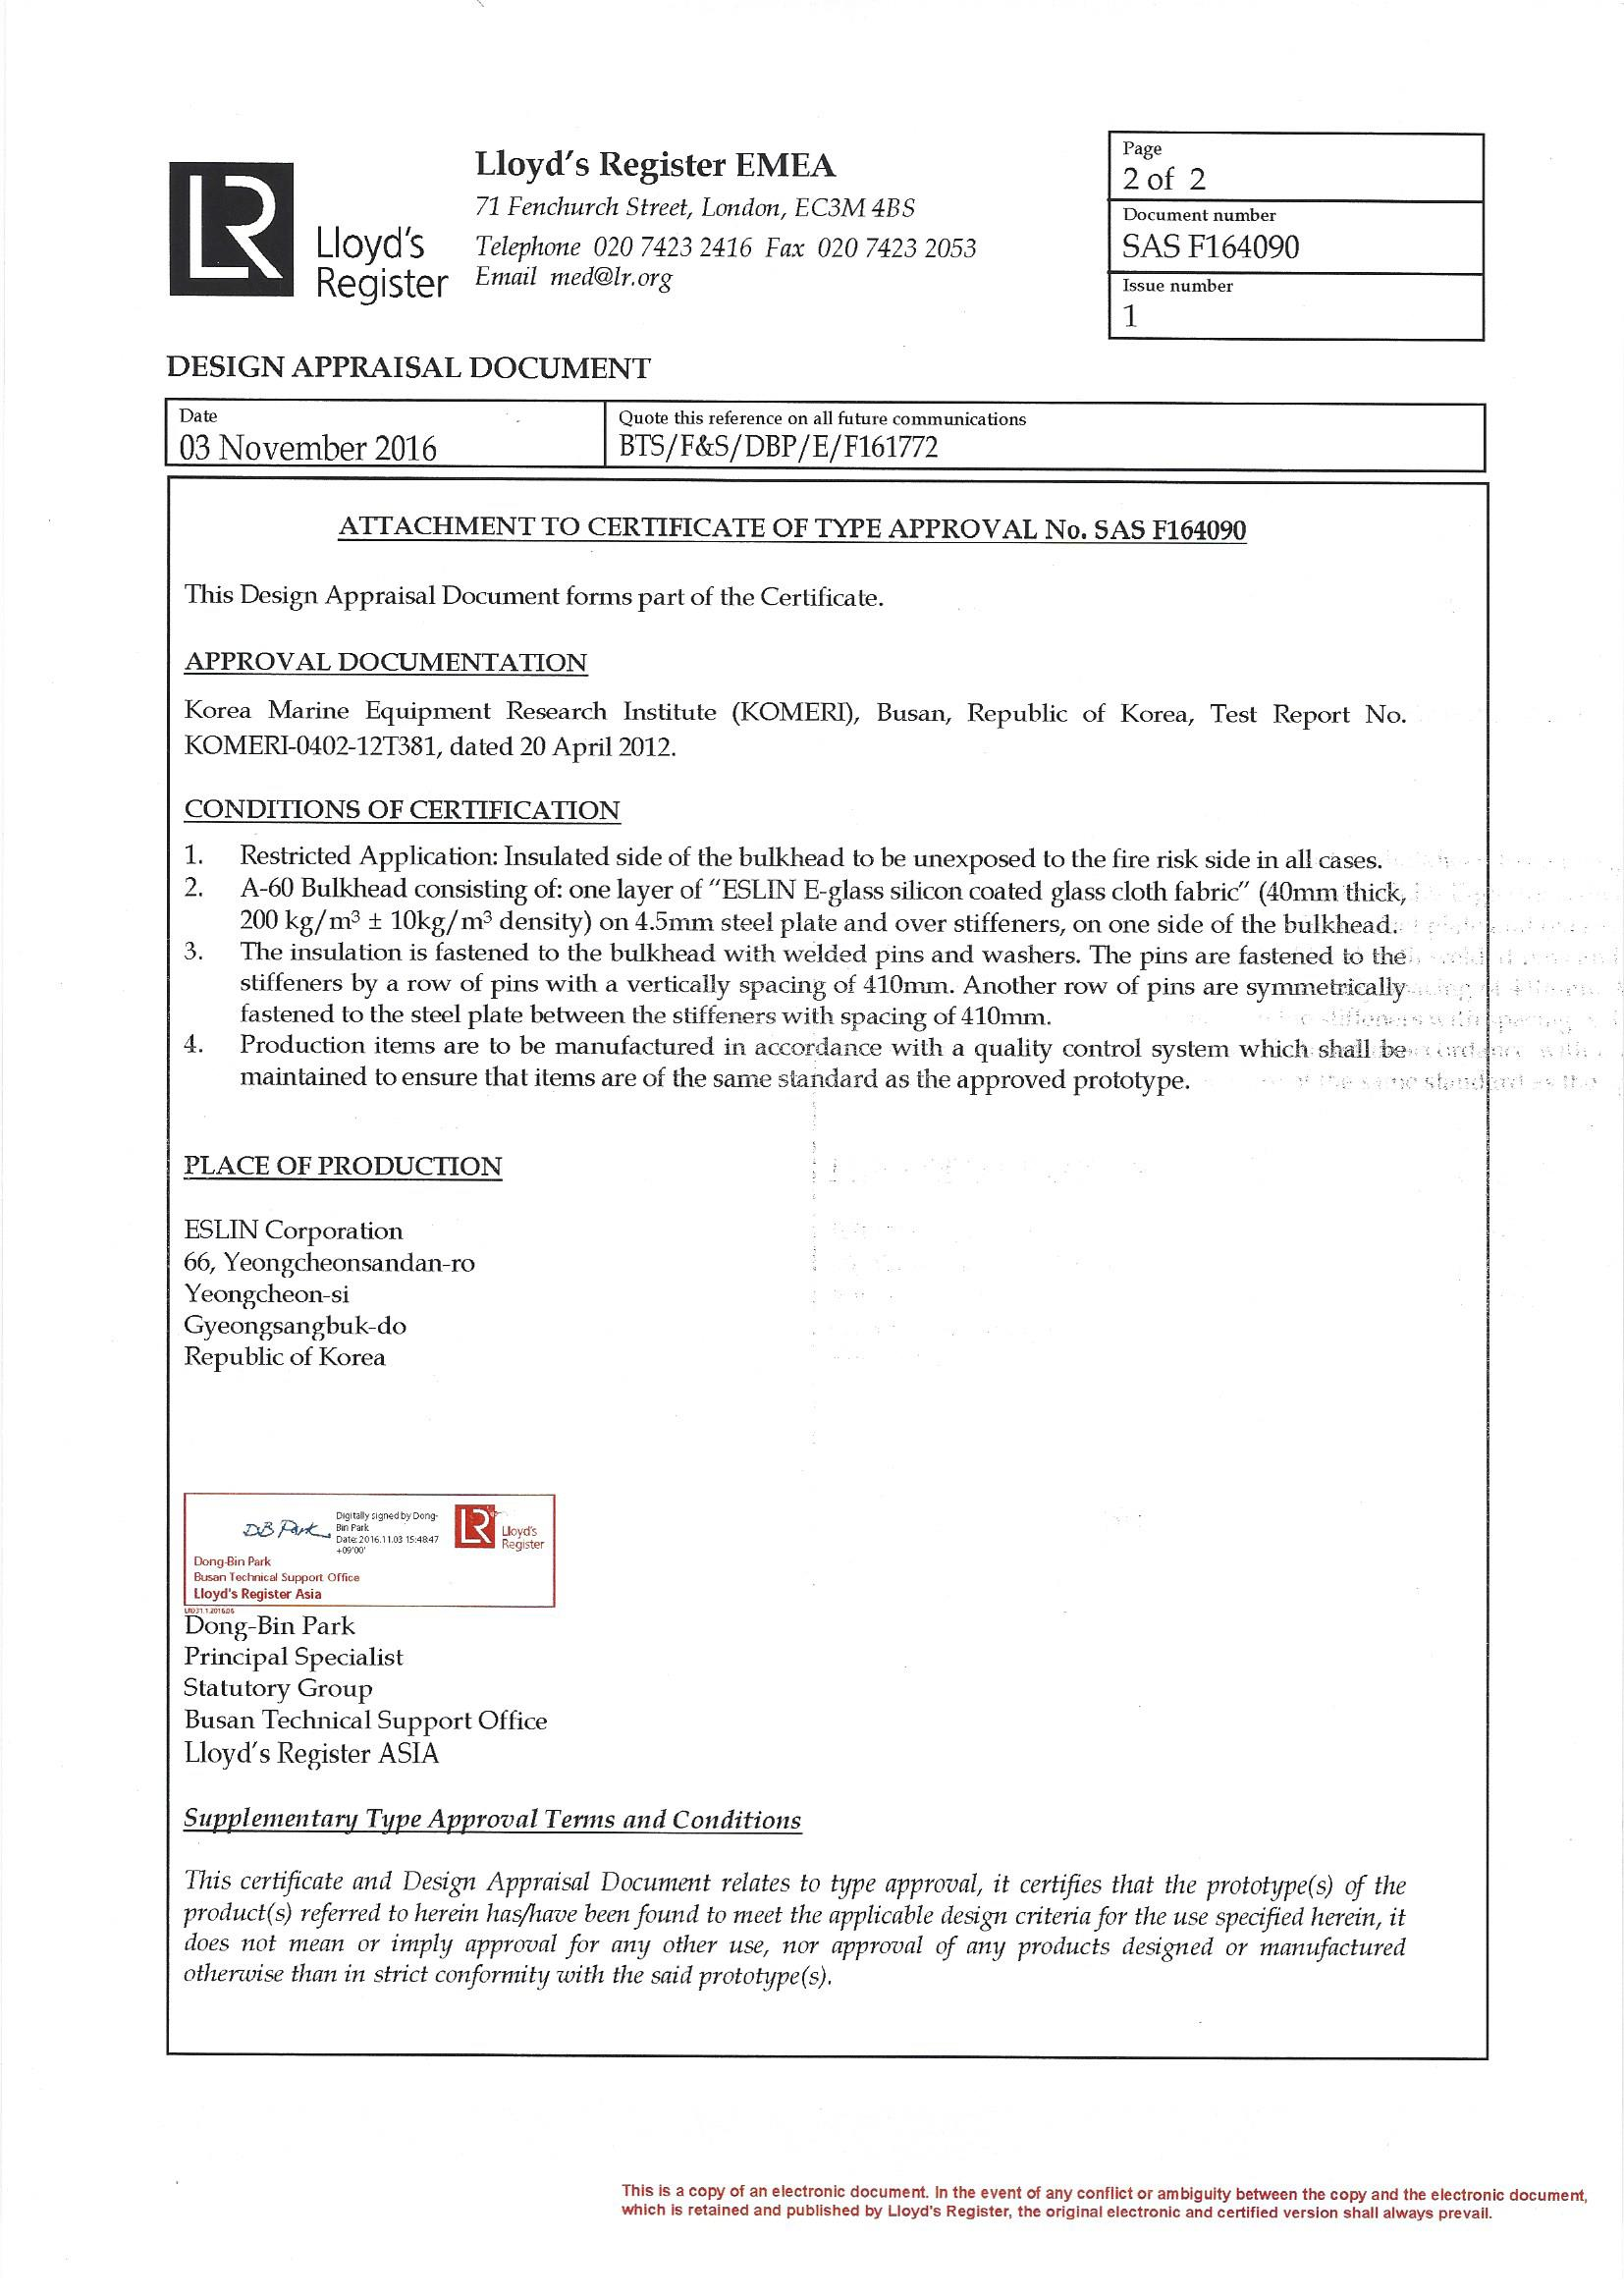 21_ESLIN A60-Bulkhead_Lloyds Resister_TAC-SASF164090_Page_2.jpg